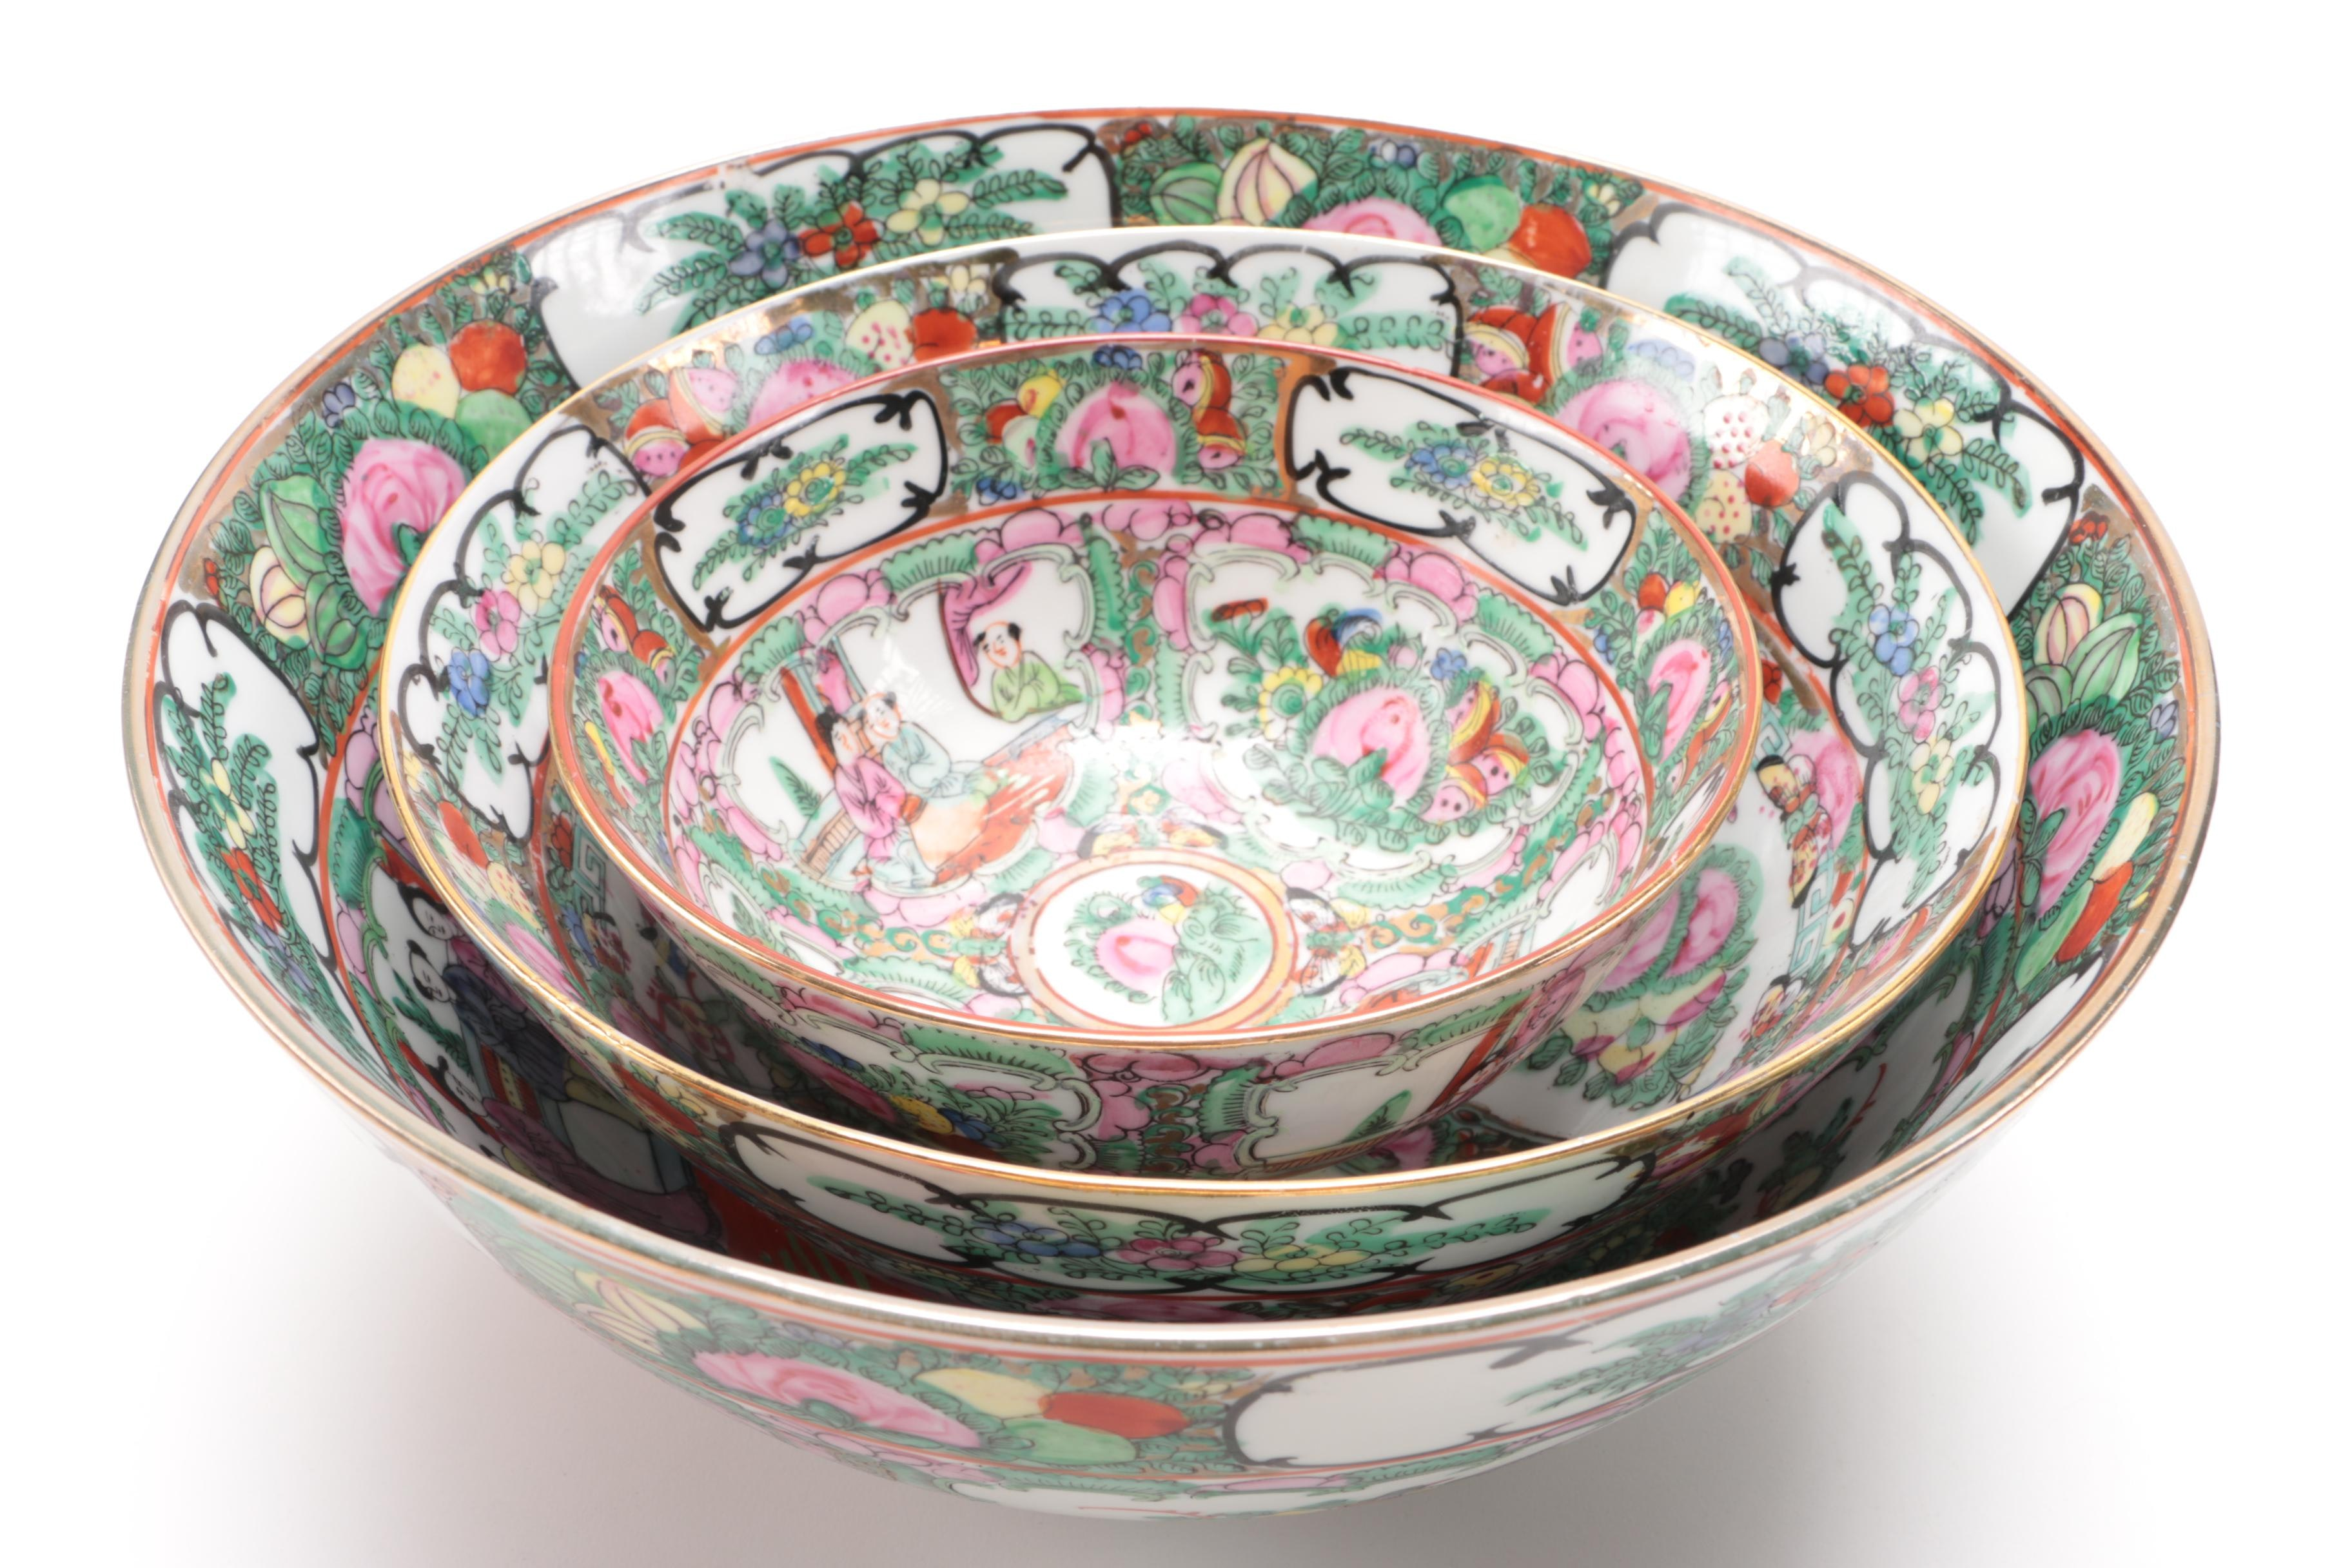 Hand-Painted Chinese Rose Medallion Nesting Porcelain Bowls